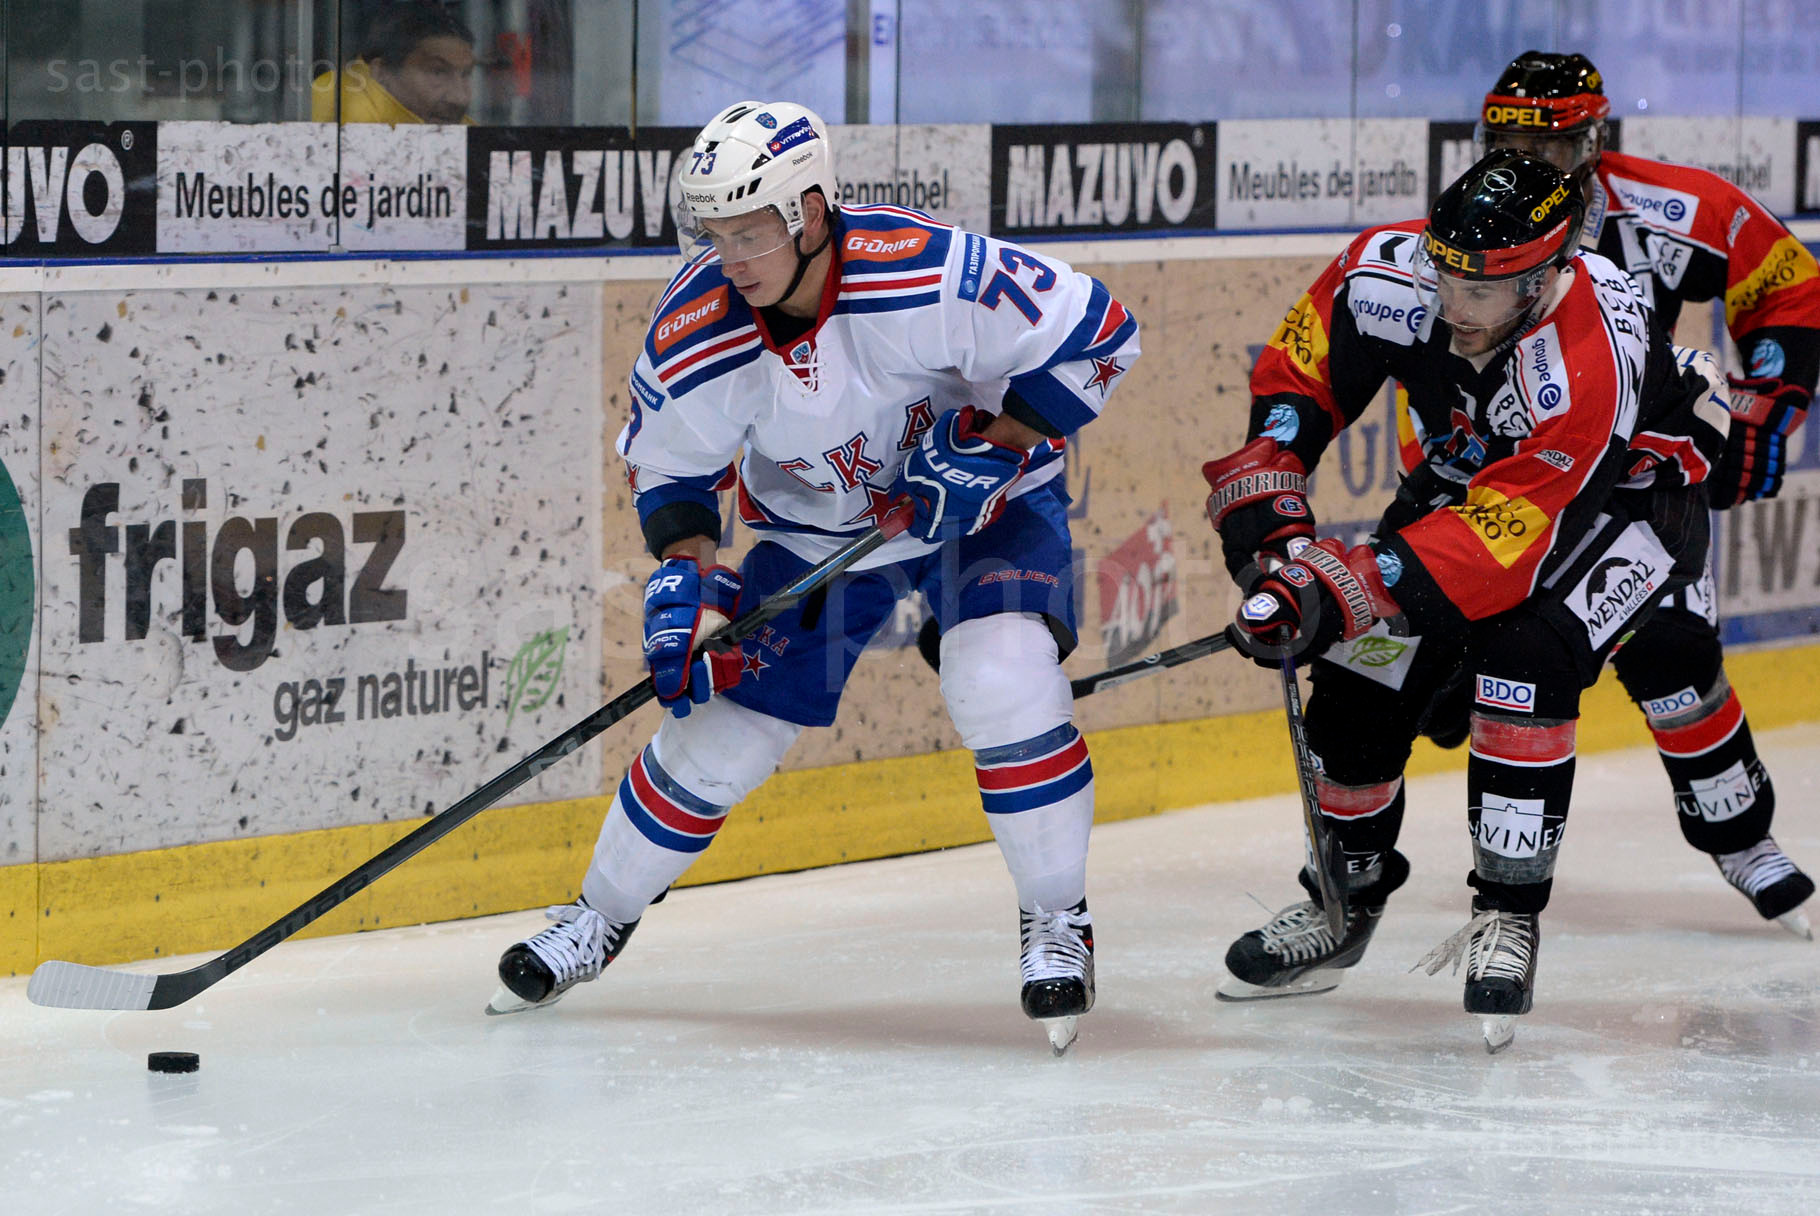 Maxim Chudinov (L. St. Petersburg) gegen Thibaut Monnet (Fribourg)